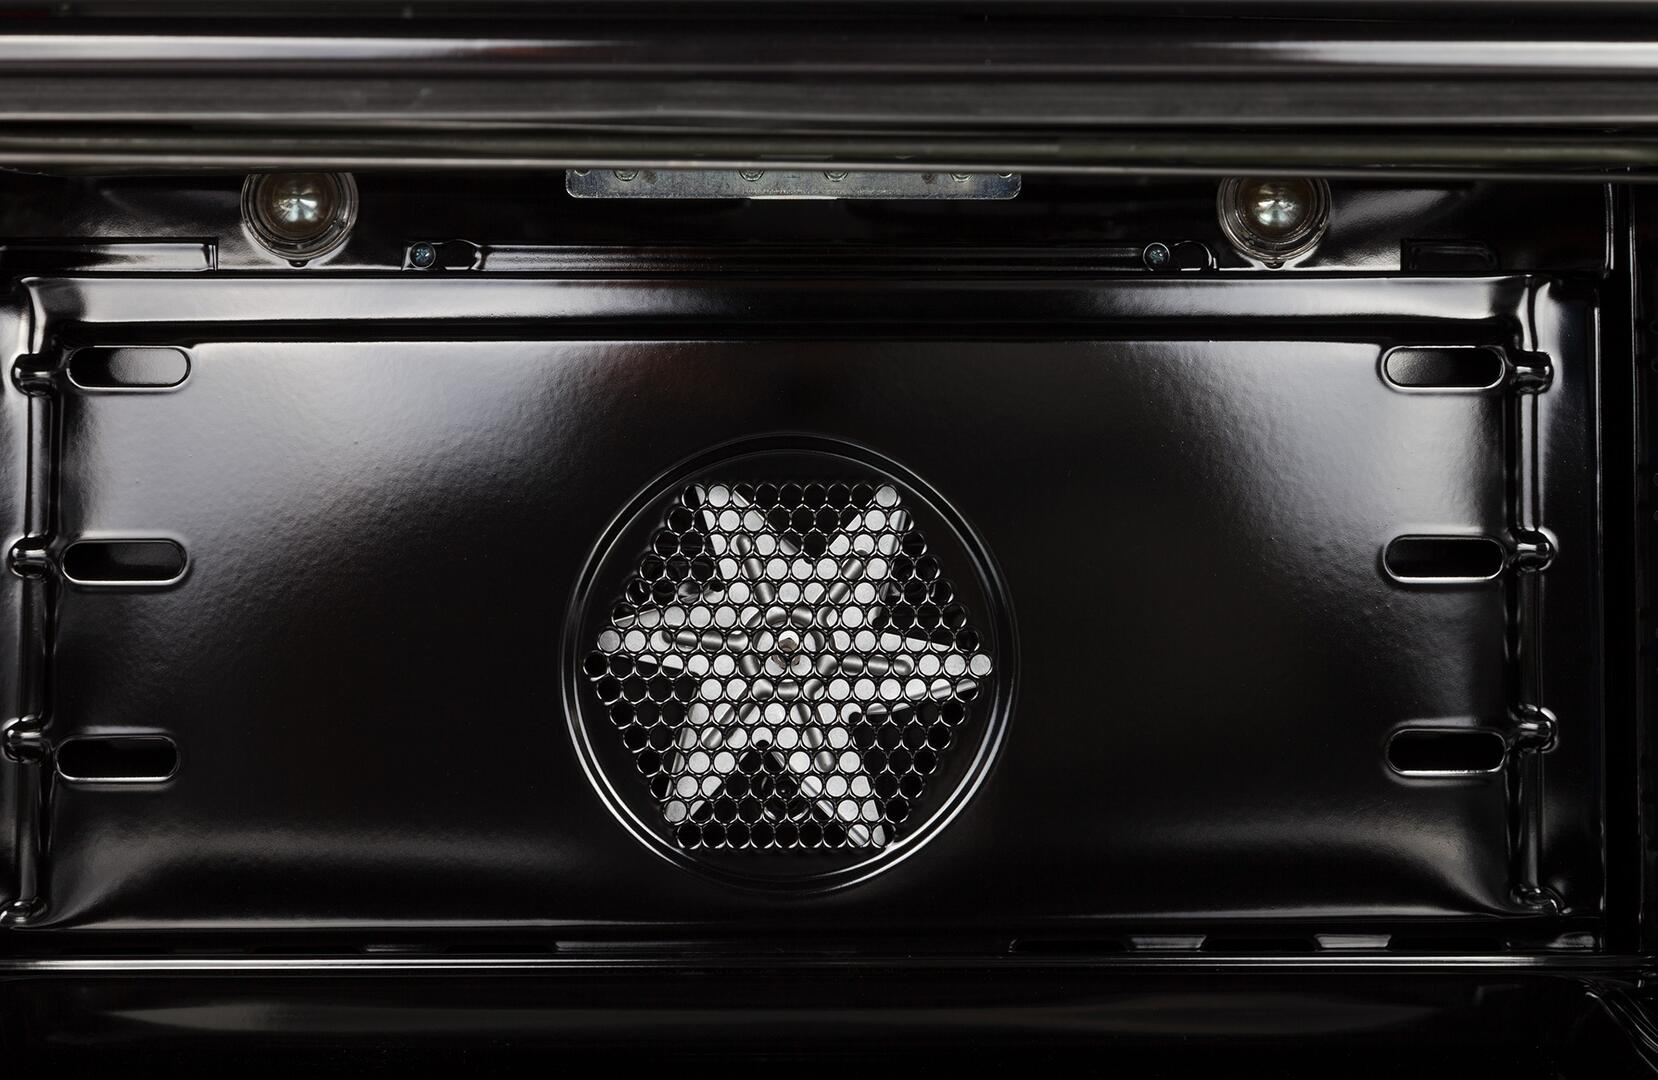 Ilve Nostalgie UPDN100FDMPVSLP Freestanding Dual Fuel Range Green, 27